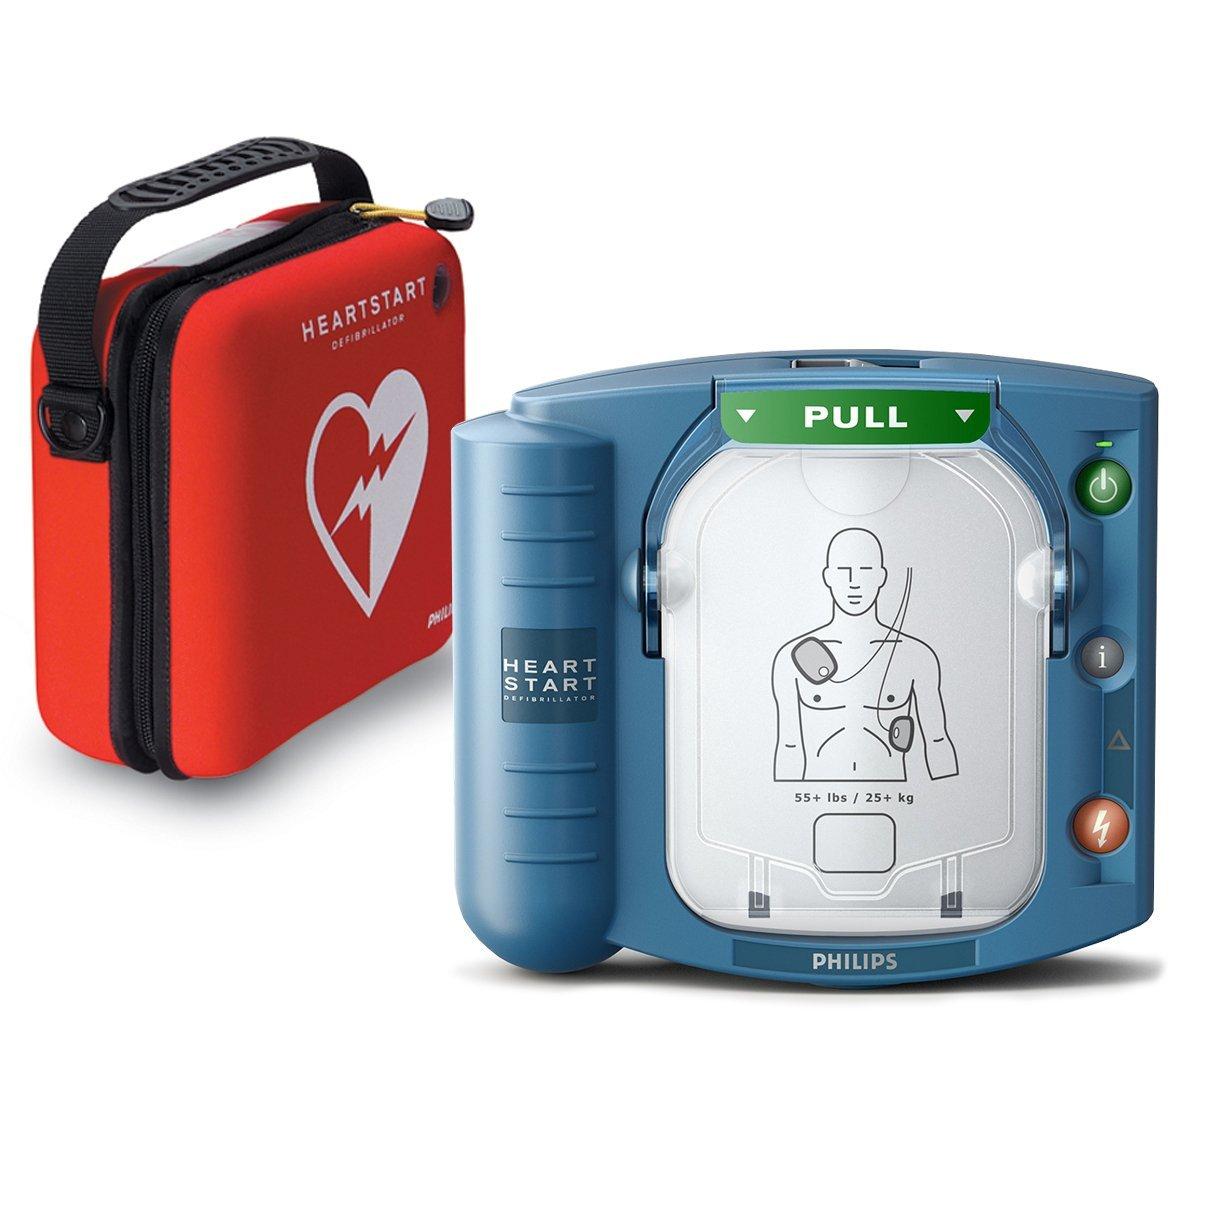 Philips HeartStart OnSite AED Defibrillator with Slim Carry Case by HeartStart